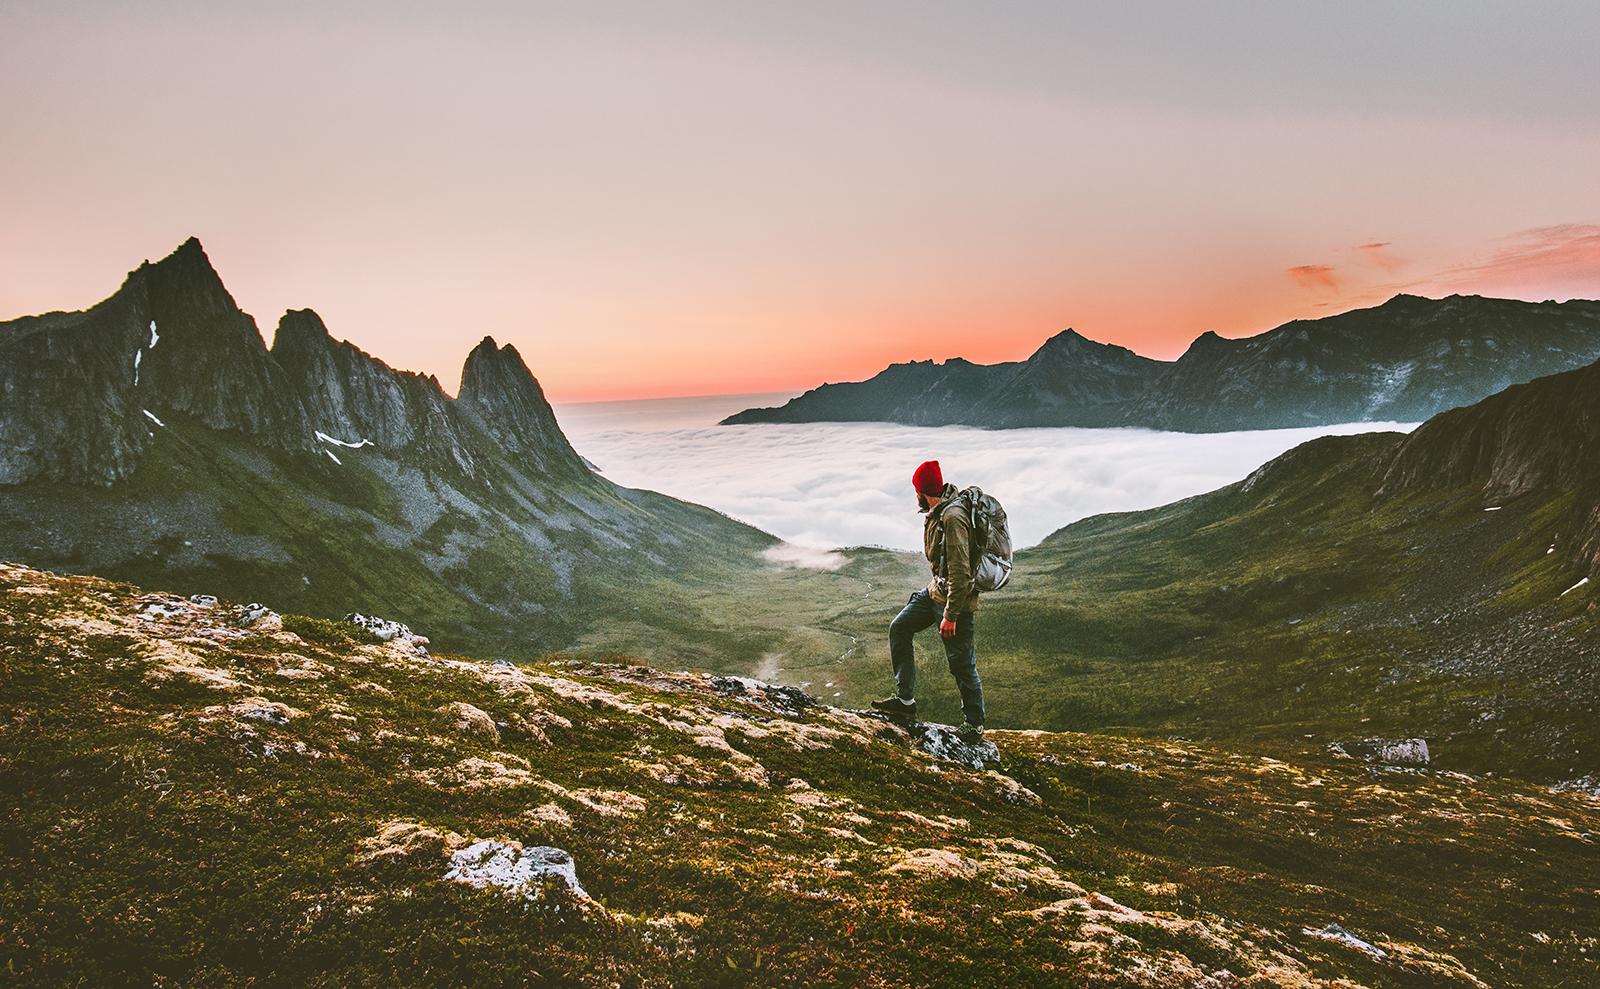 man-walking-in-nature-serene-spiritual-peace-nature